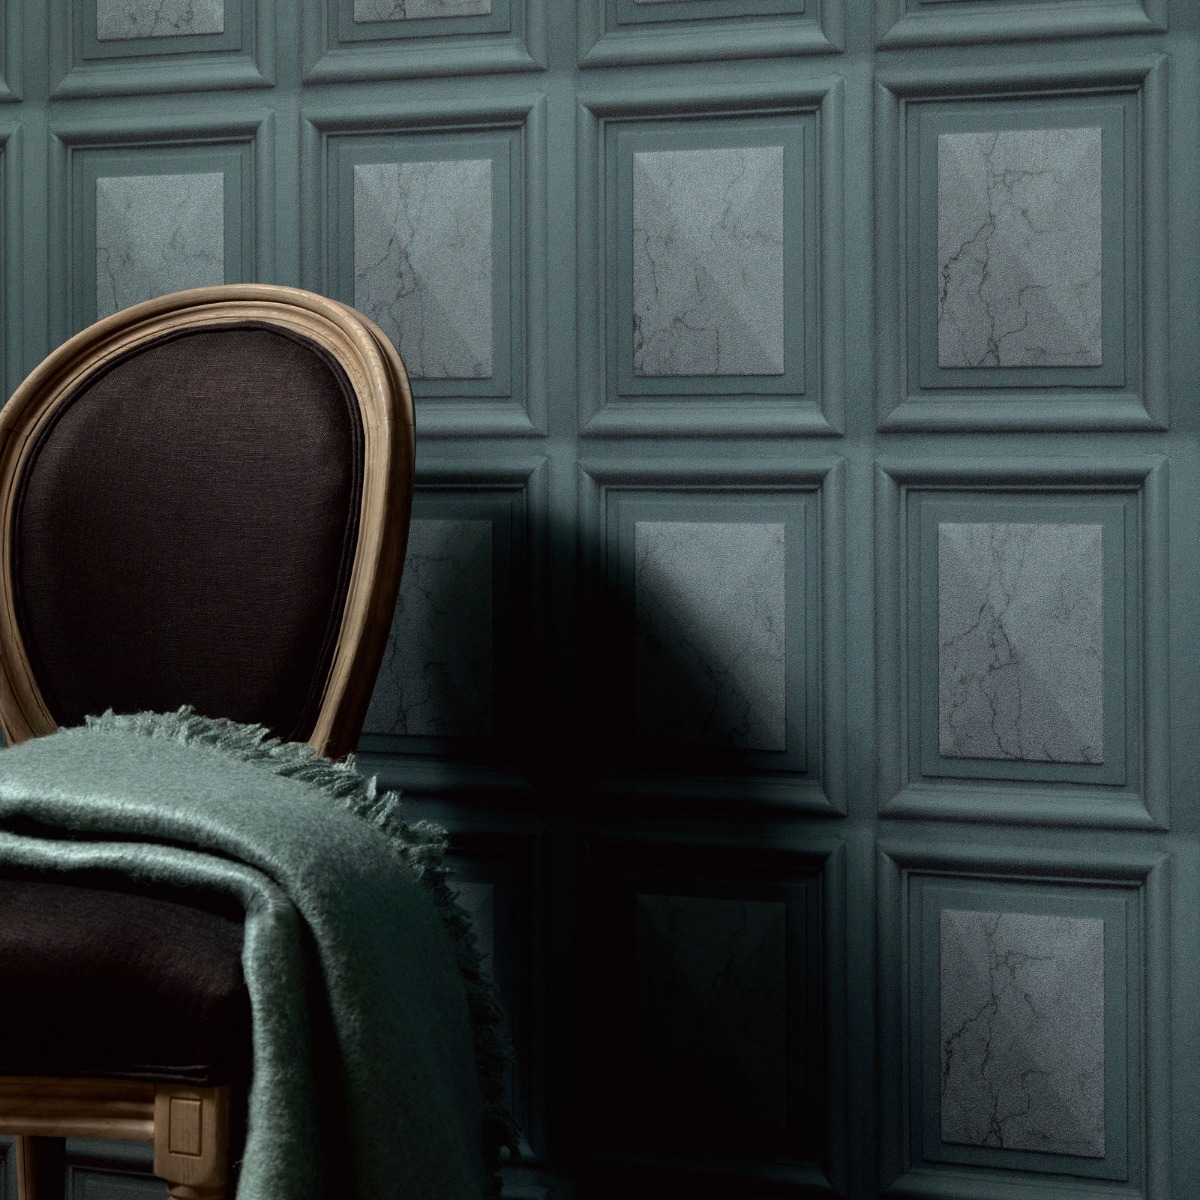 Erismann Imitations Marble Wood Panel Effect Wallpaper Teal (6319-18-BUR)